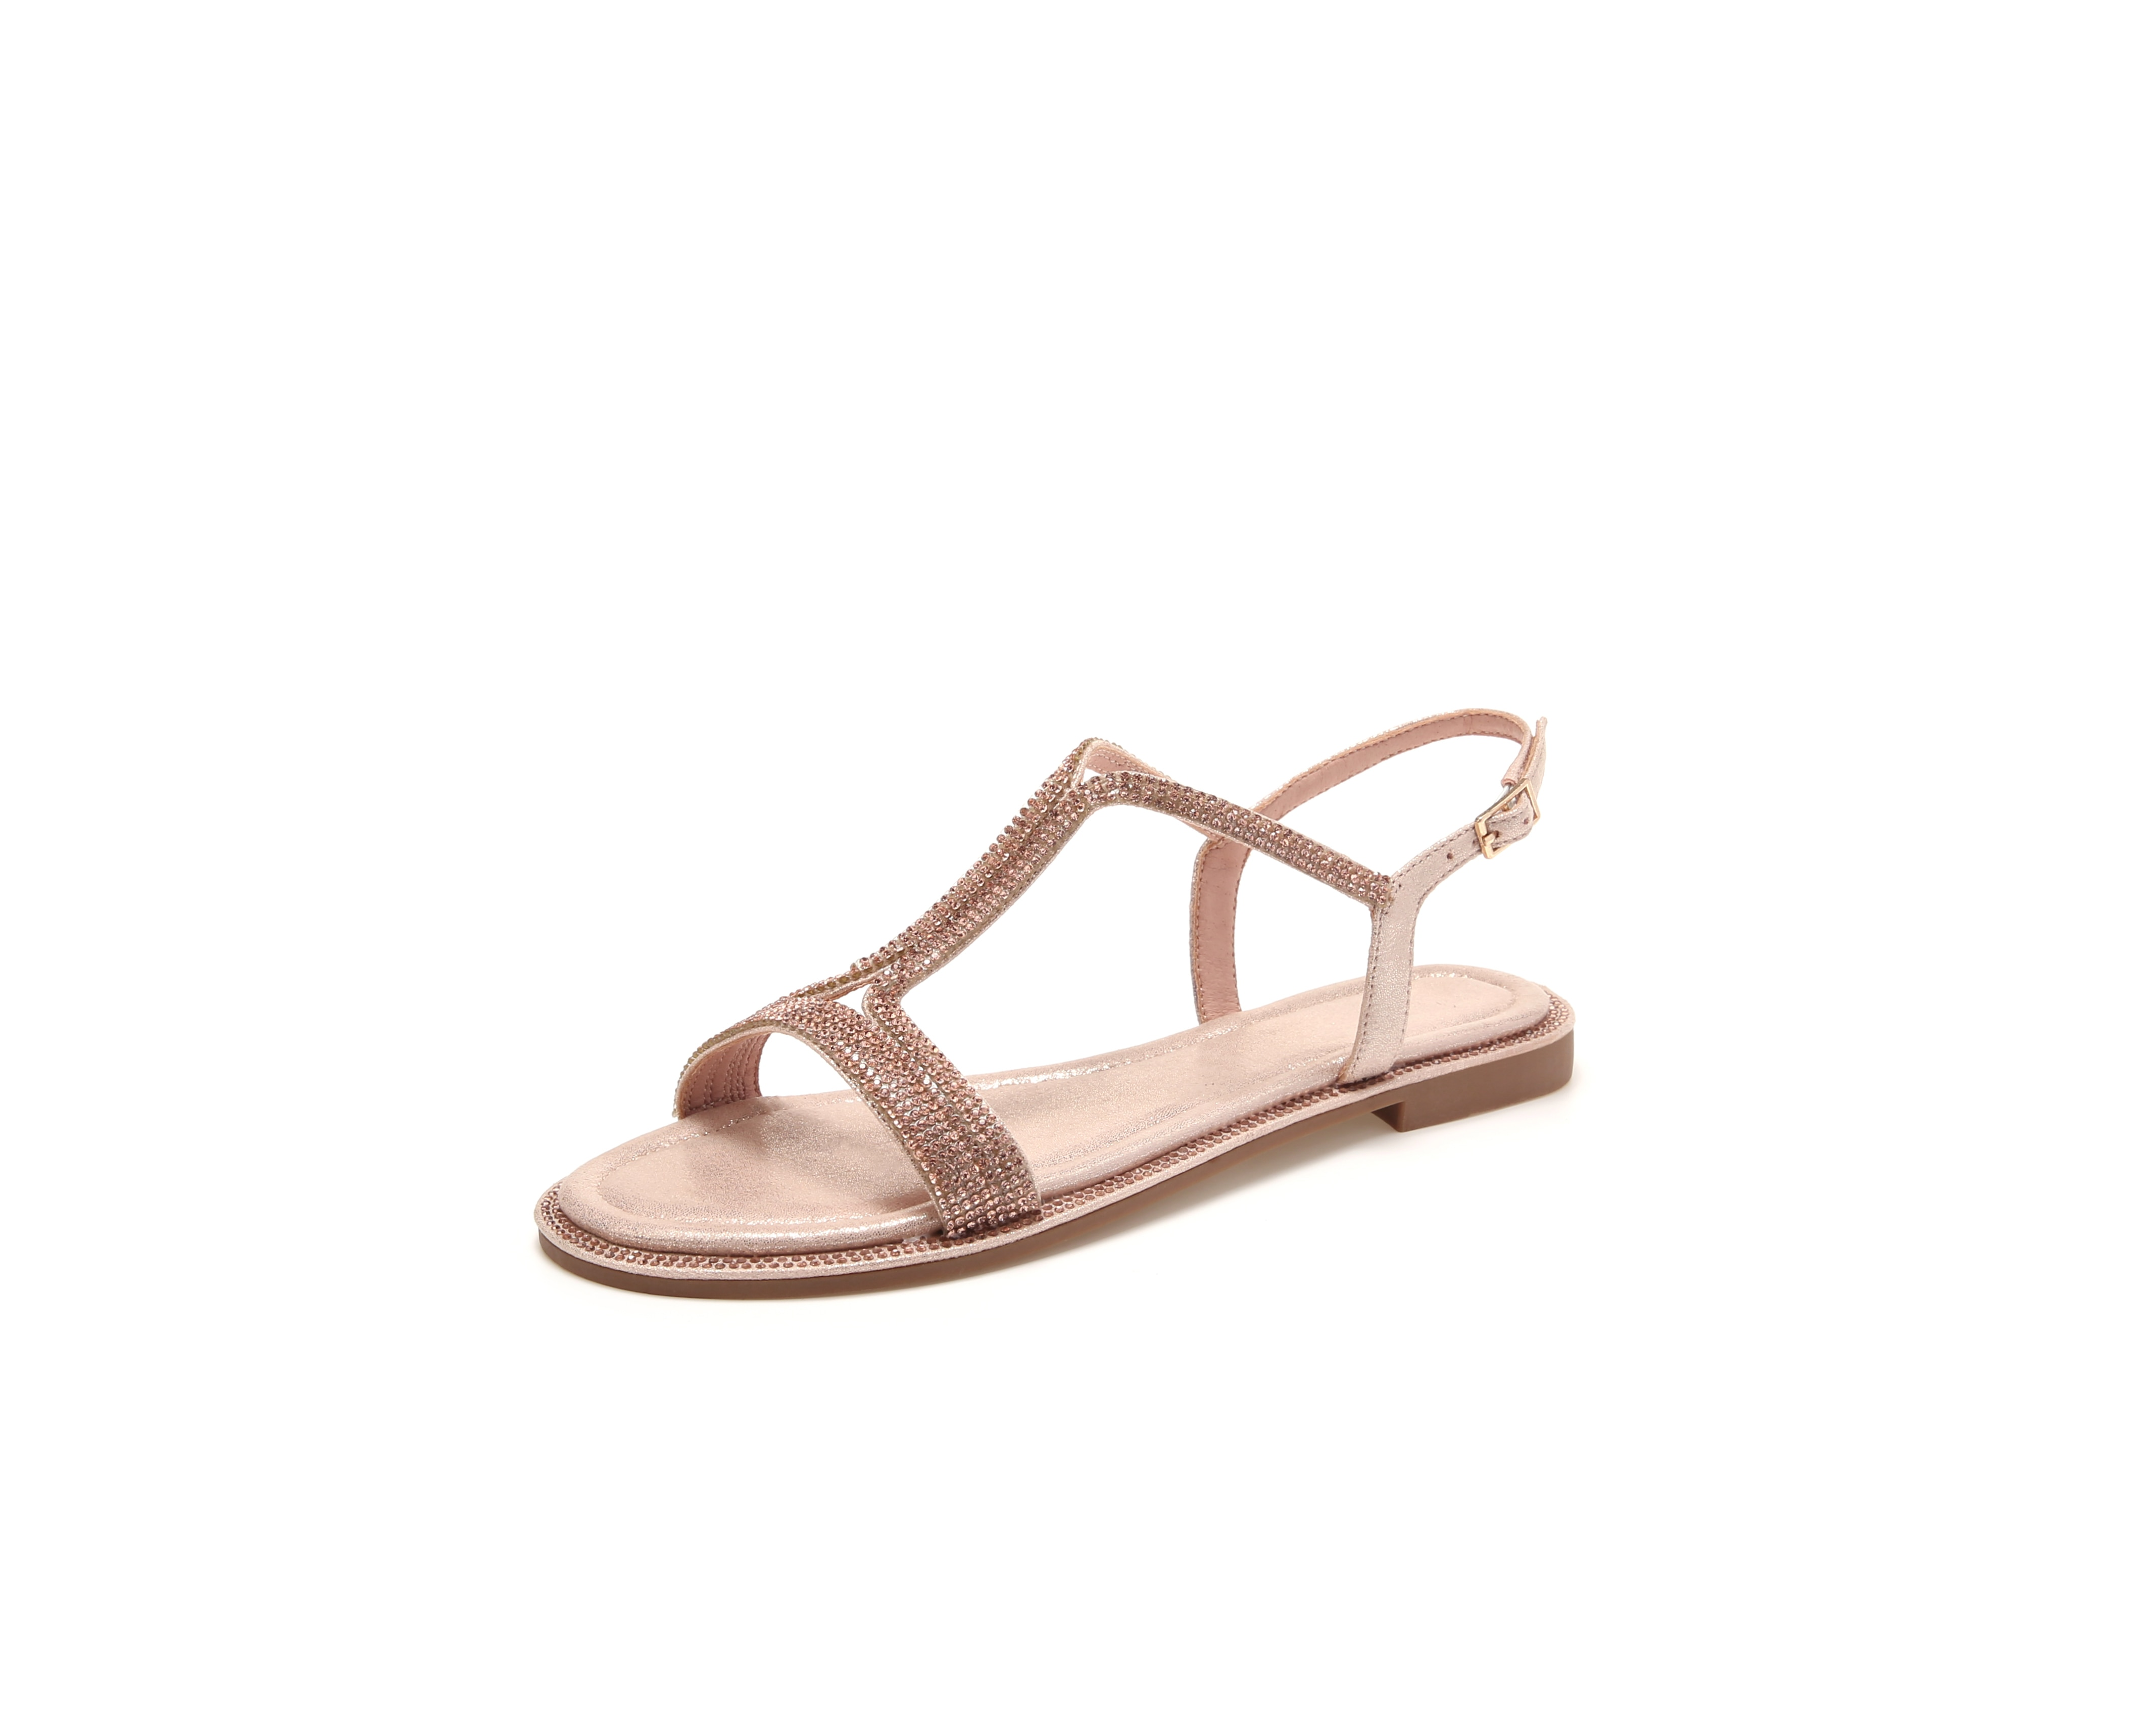 Women Summer Flat Bling Slippers Transparent Soft Jelly Shoes Female Flip Flops Sandals Outdoor Beach Ladies Slides Drop Ship